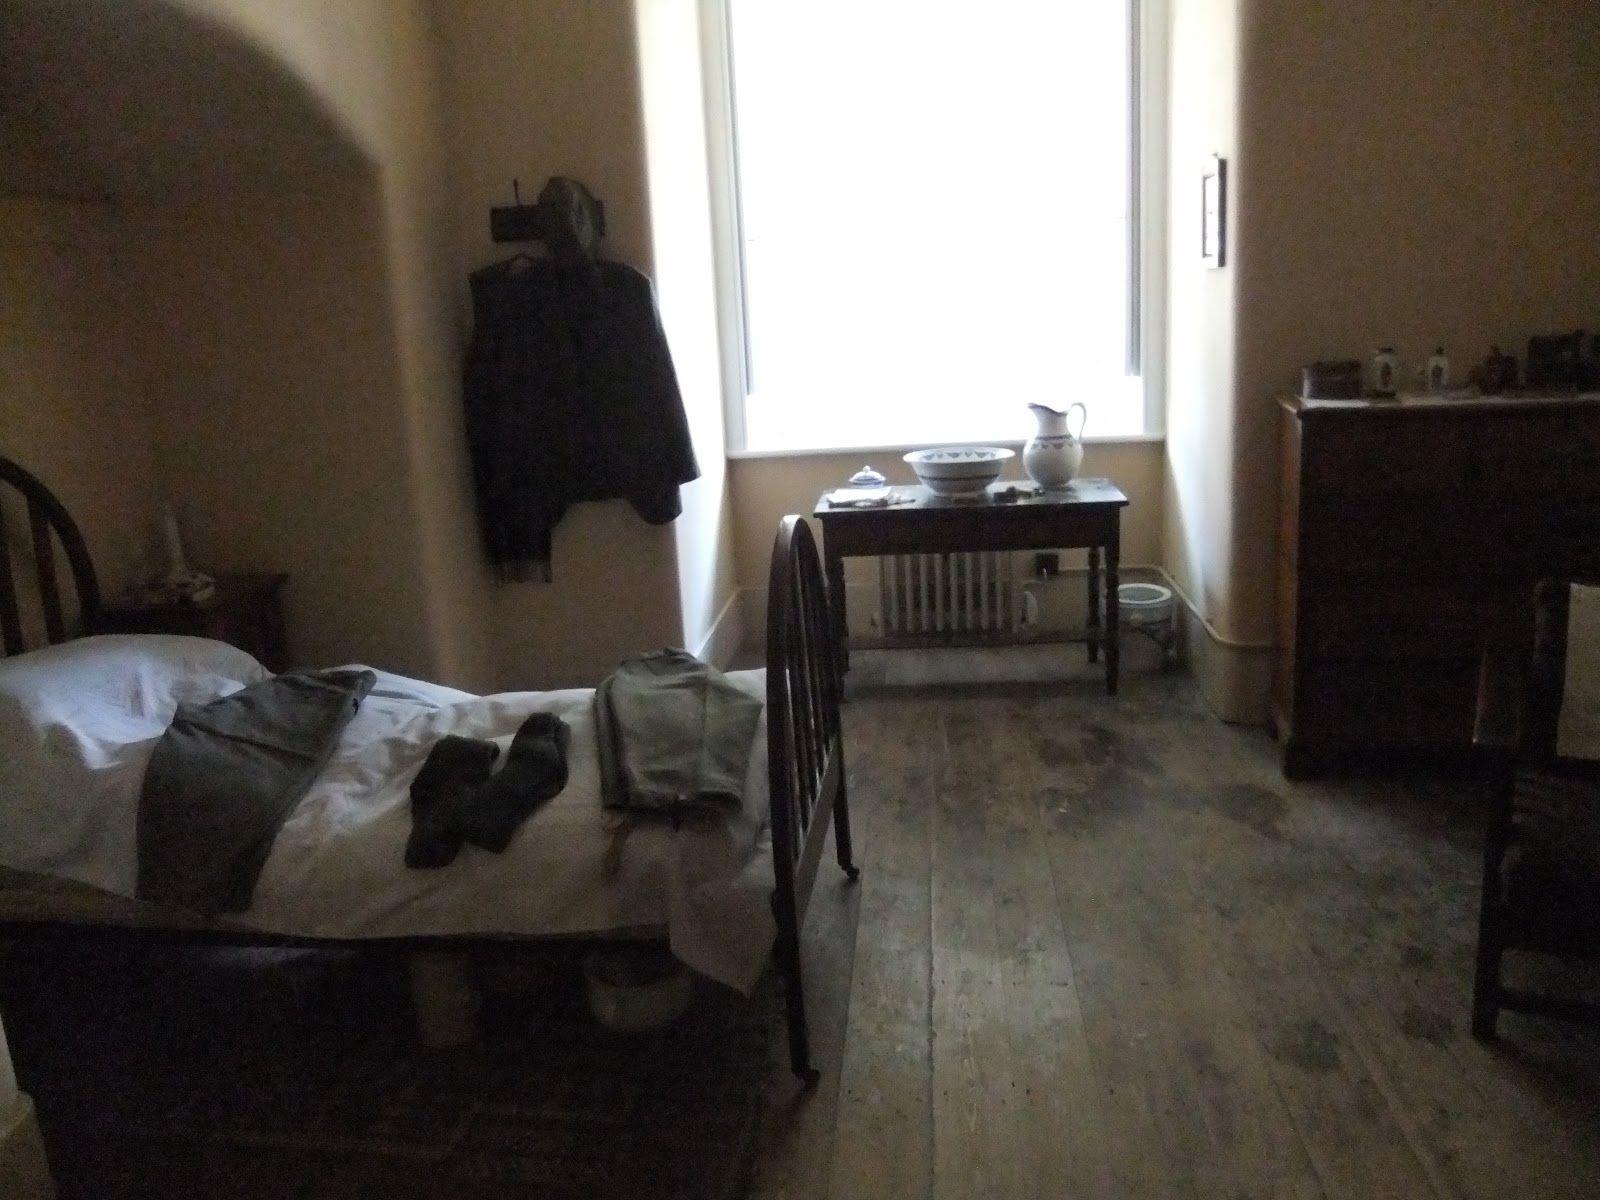 Visiting servant 39 s bedroom at ickworth house the basement for Servant quarters designs